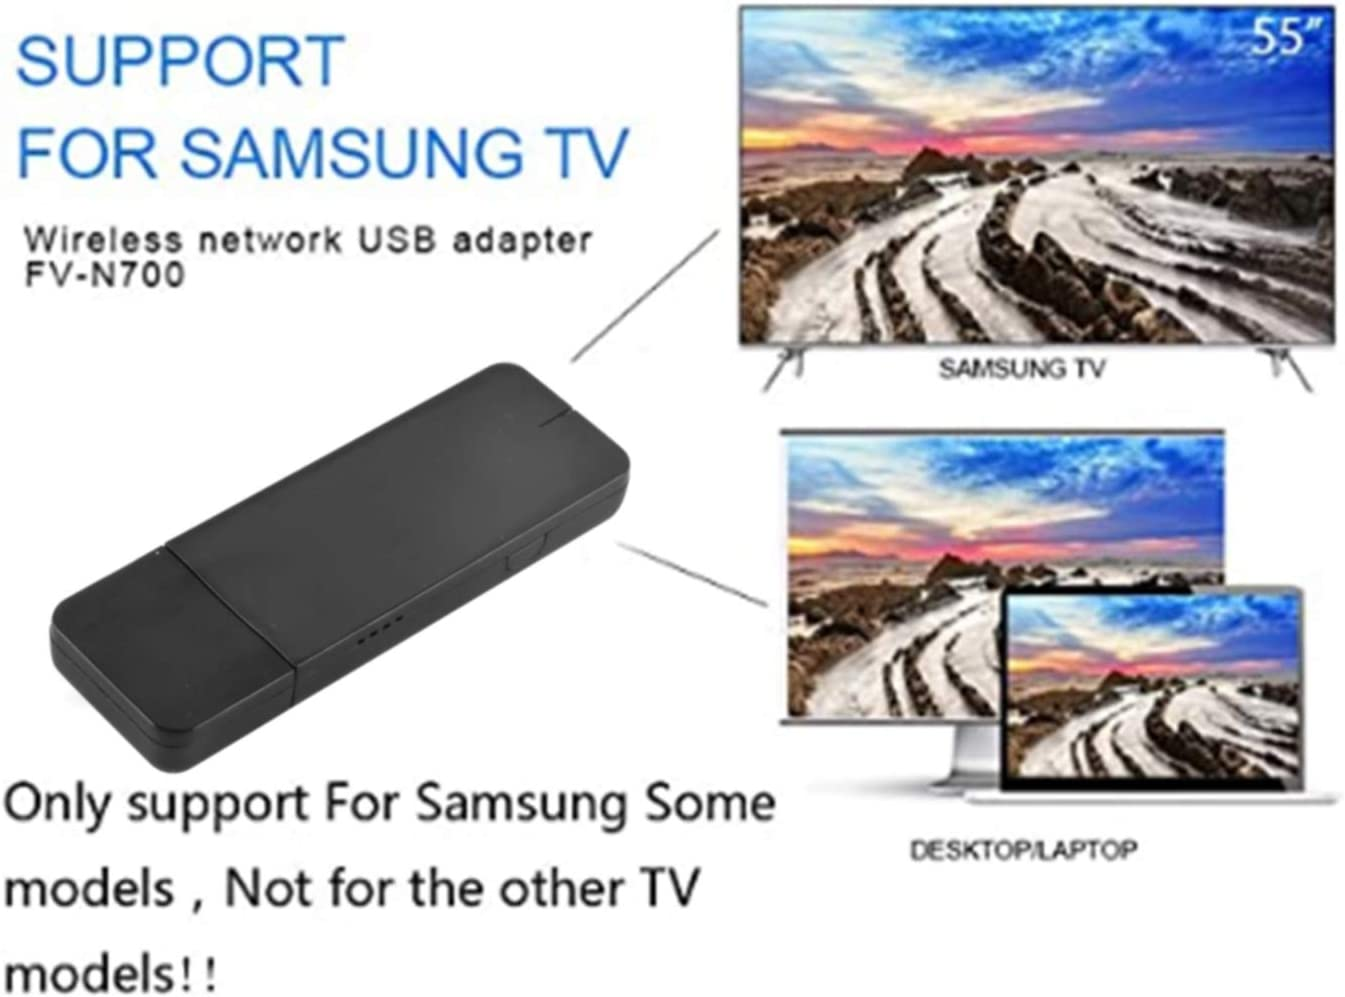 Dicrey USB Wireless WiFi Adapter Samsung TV Wireless WiFi Network Card Adapter 300Mbps Dual Band 2.4G/5G Wireless 802.11 USB2.0 Wi-Fi LAN Adapter for Samsung Smart TV Laptop Desktop 1pcs